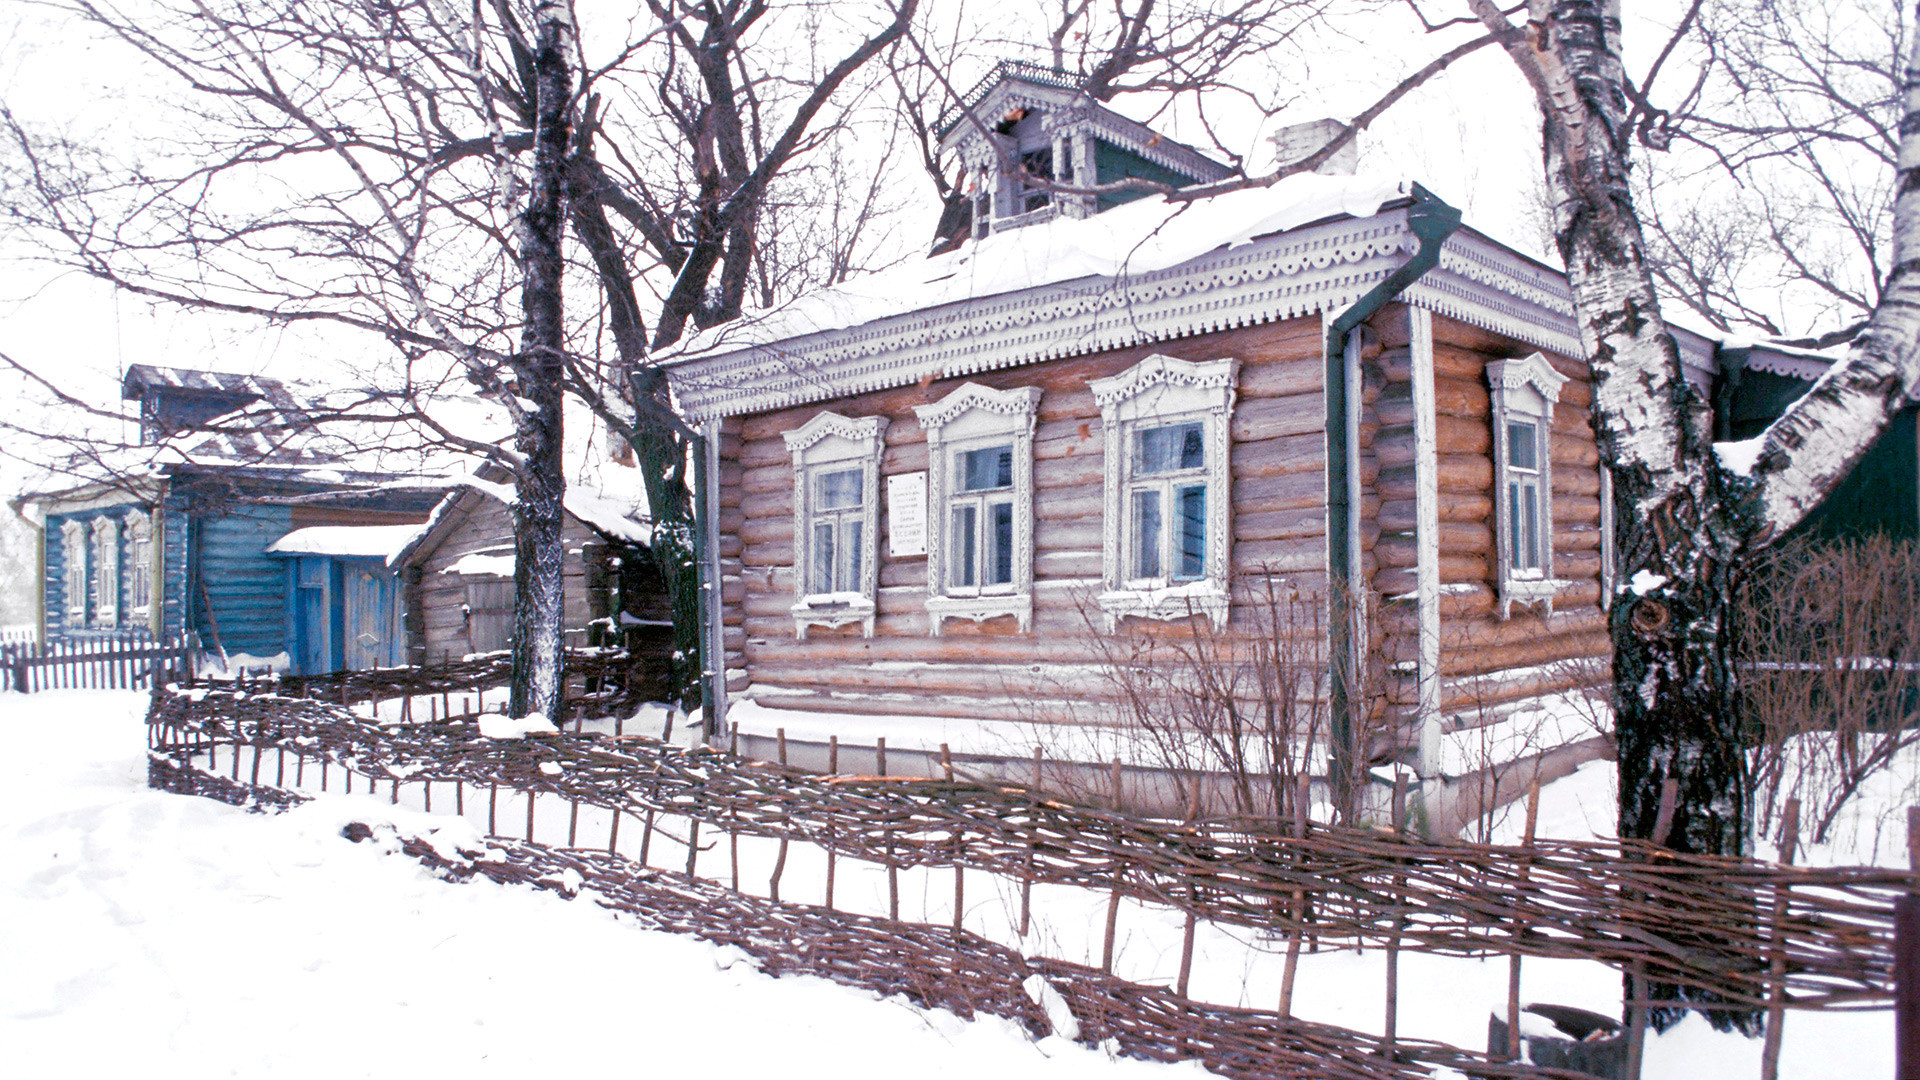 Rumah penyair Sergey Yesenin di Desa Konstantinovo